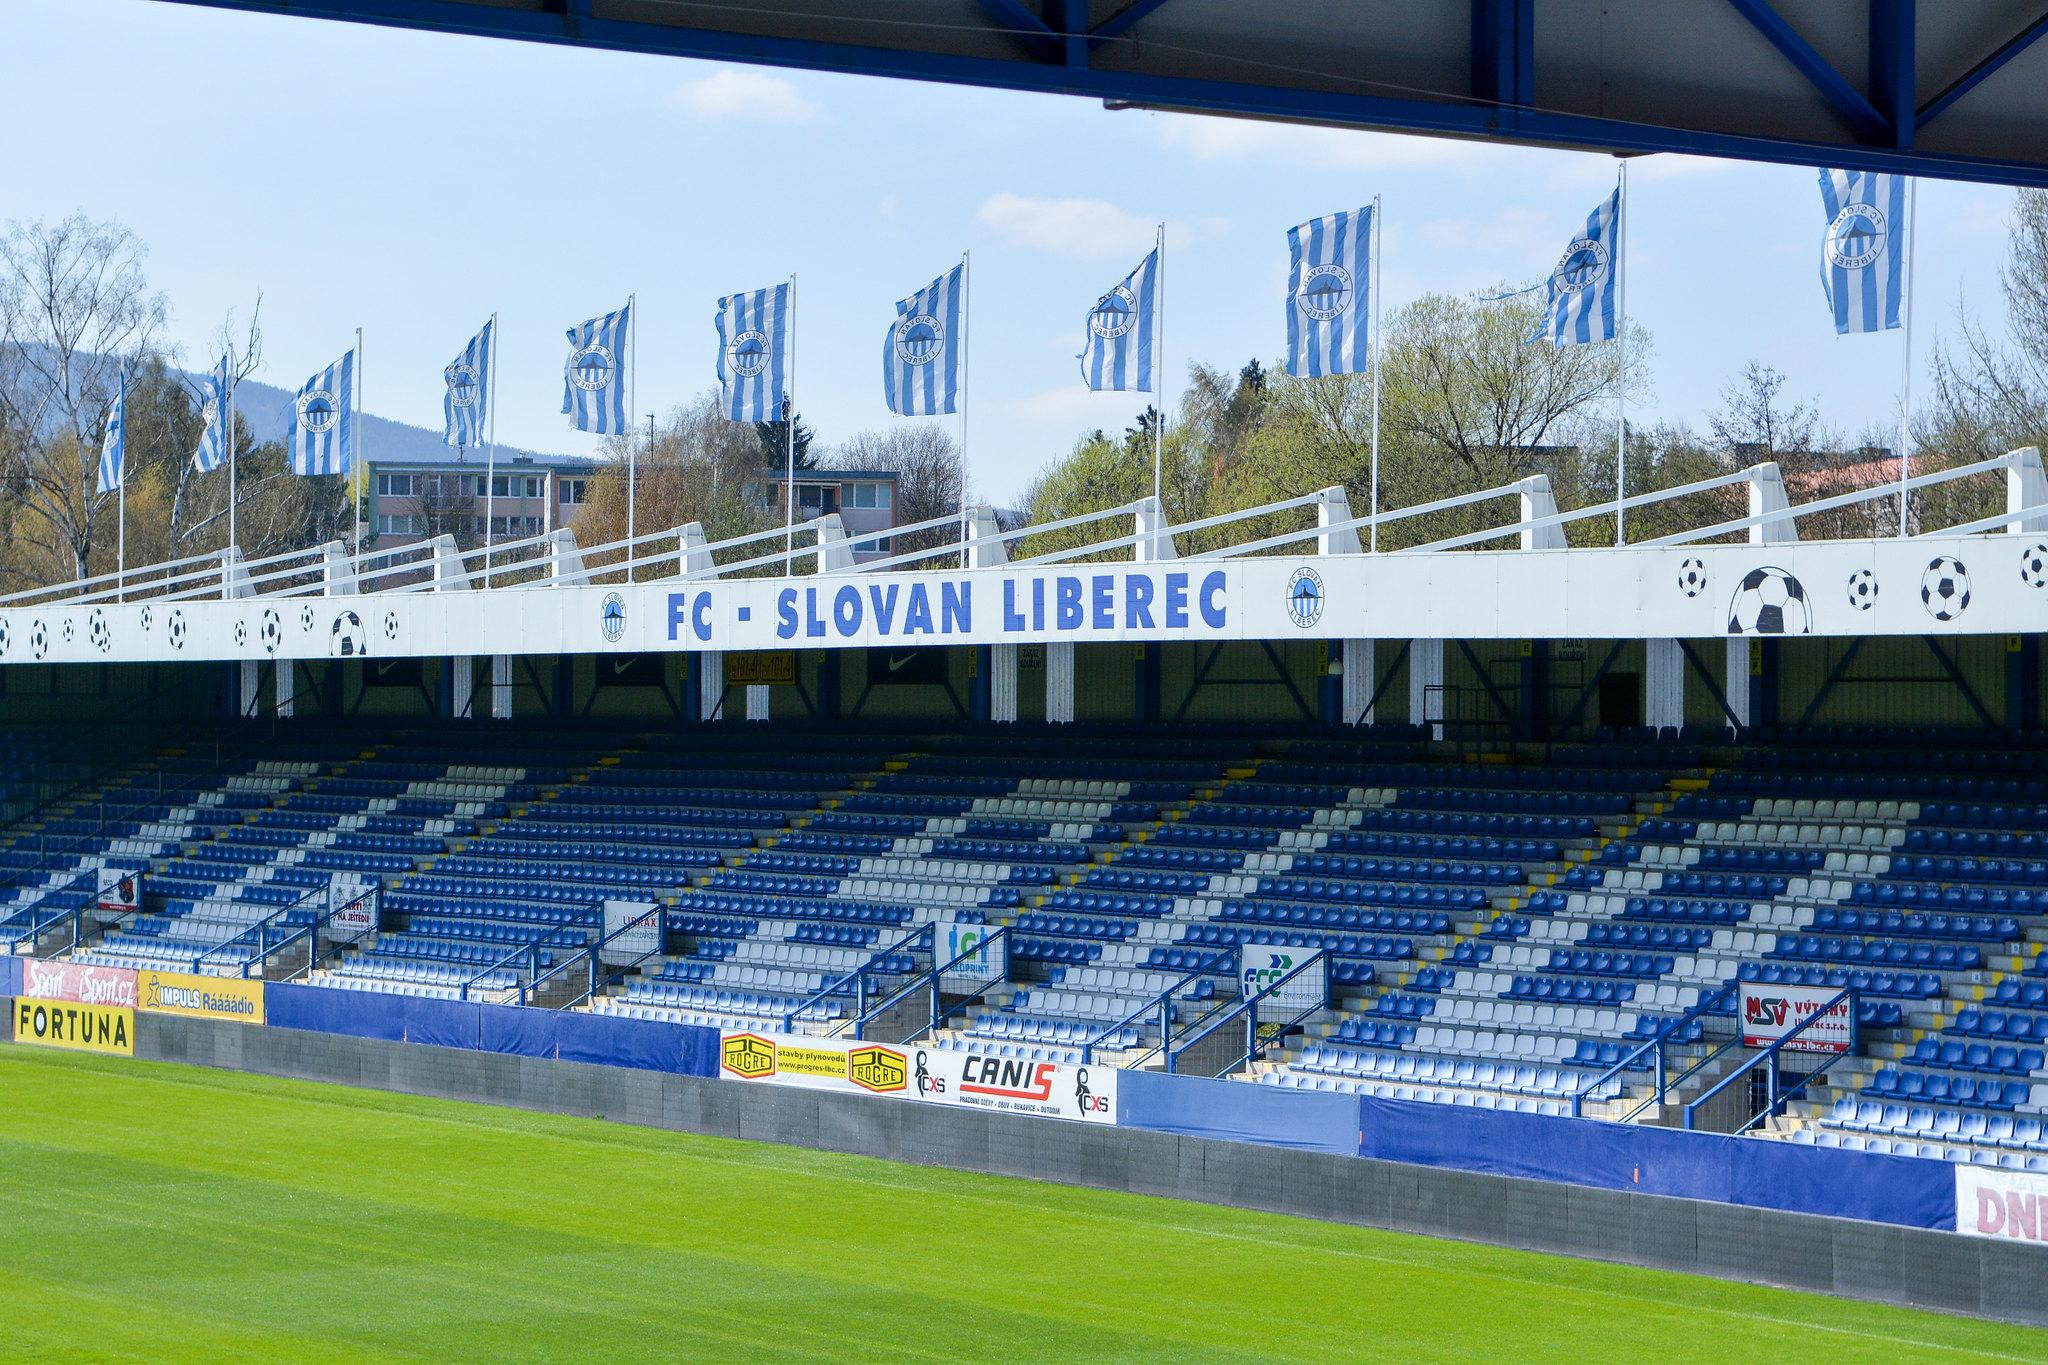 Stadion FC Slovan Liberec